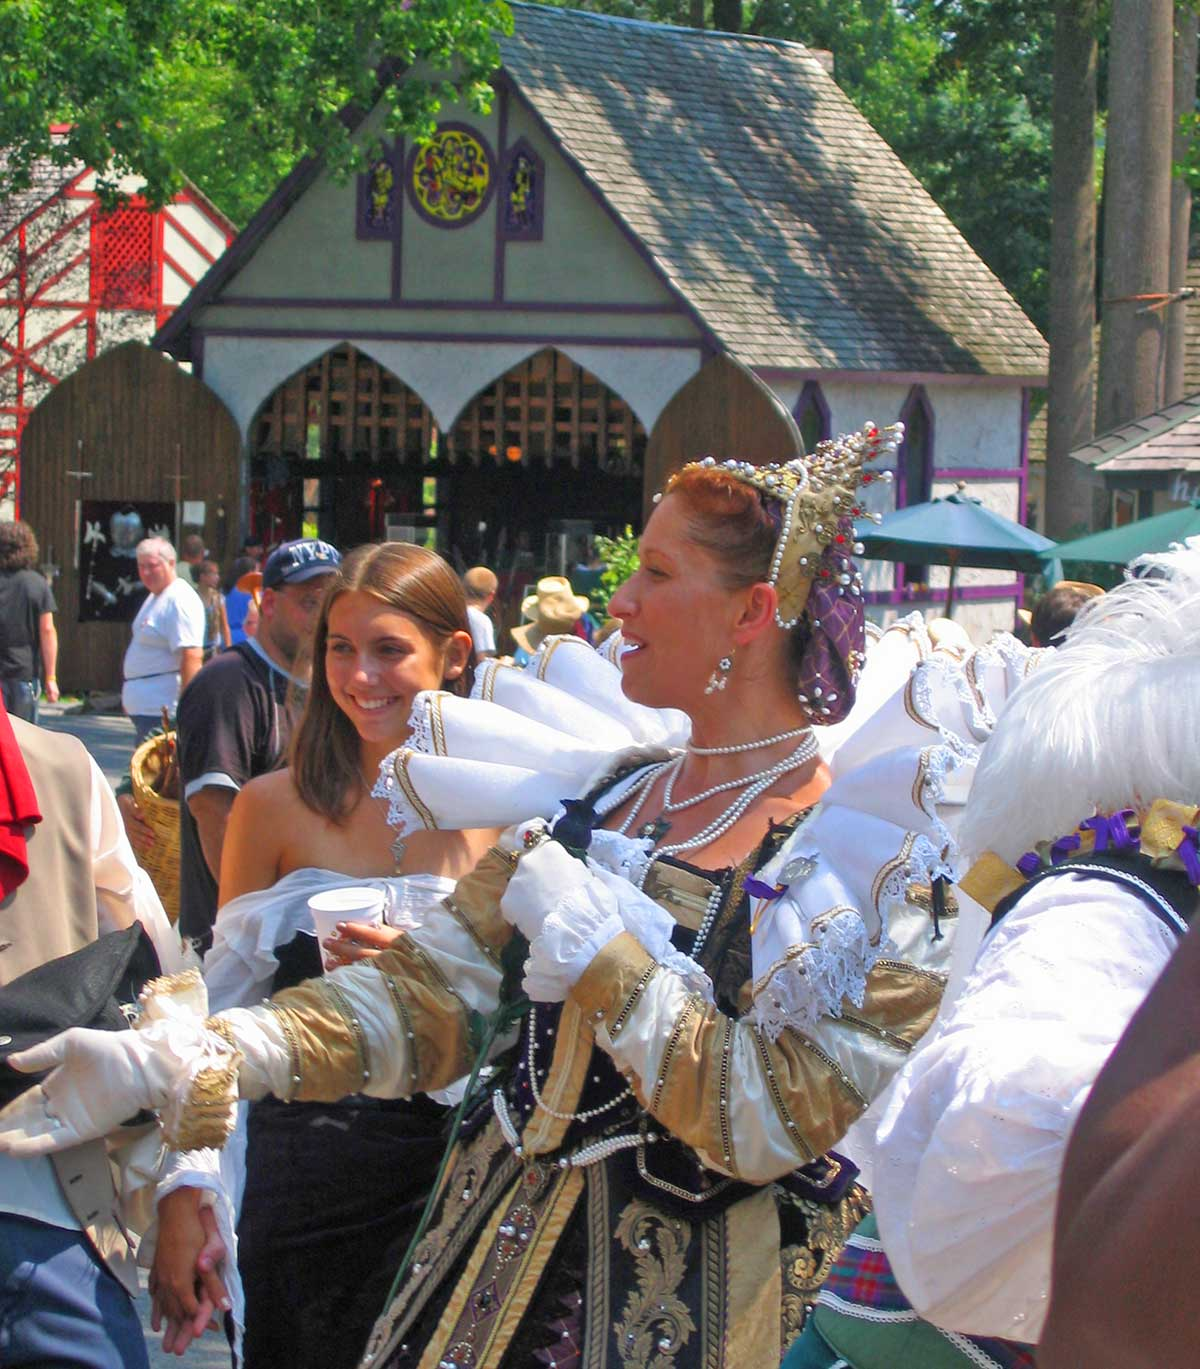 PA Renaissance Faire, Manheim, PA